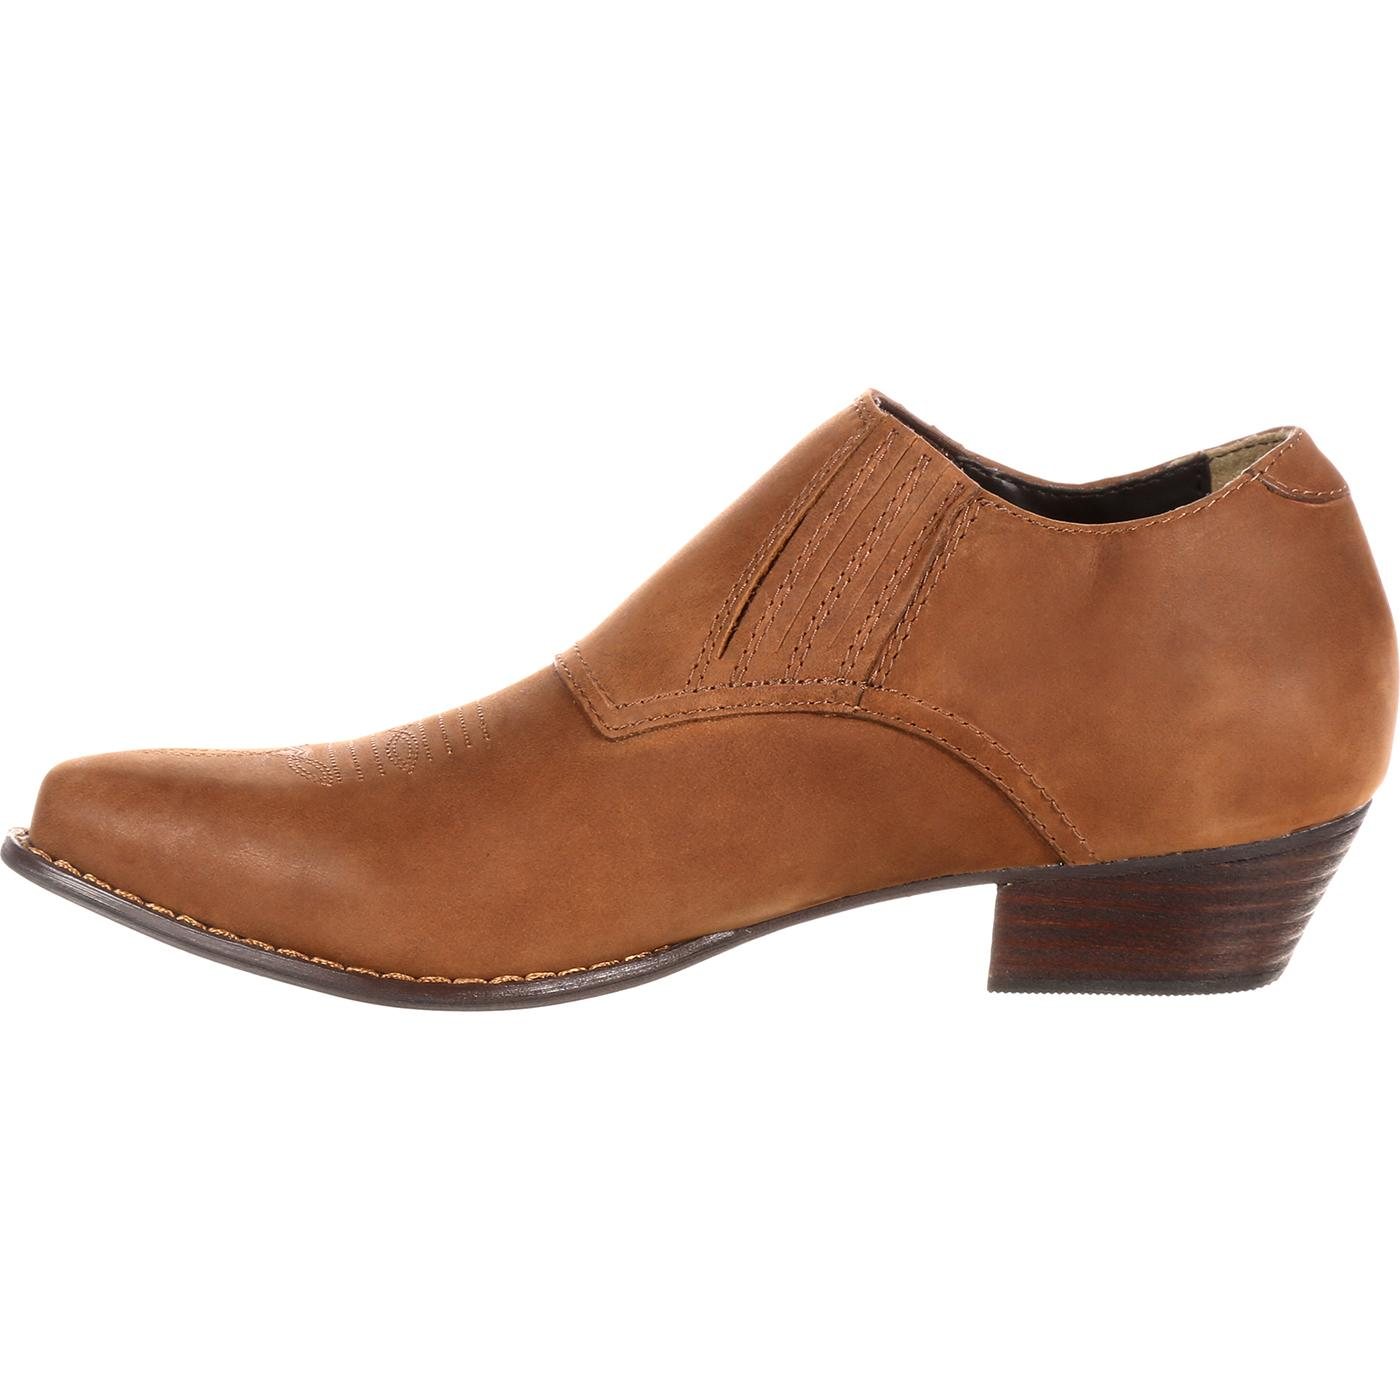 19ebda6b5 Crush by Durango: Women's Comfort Brown Western Shoe Boot